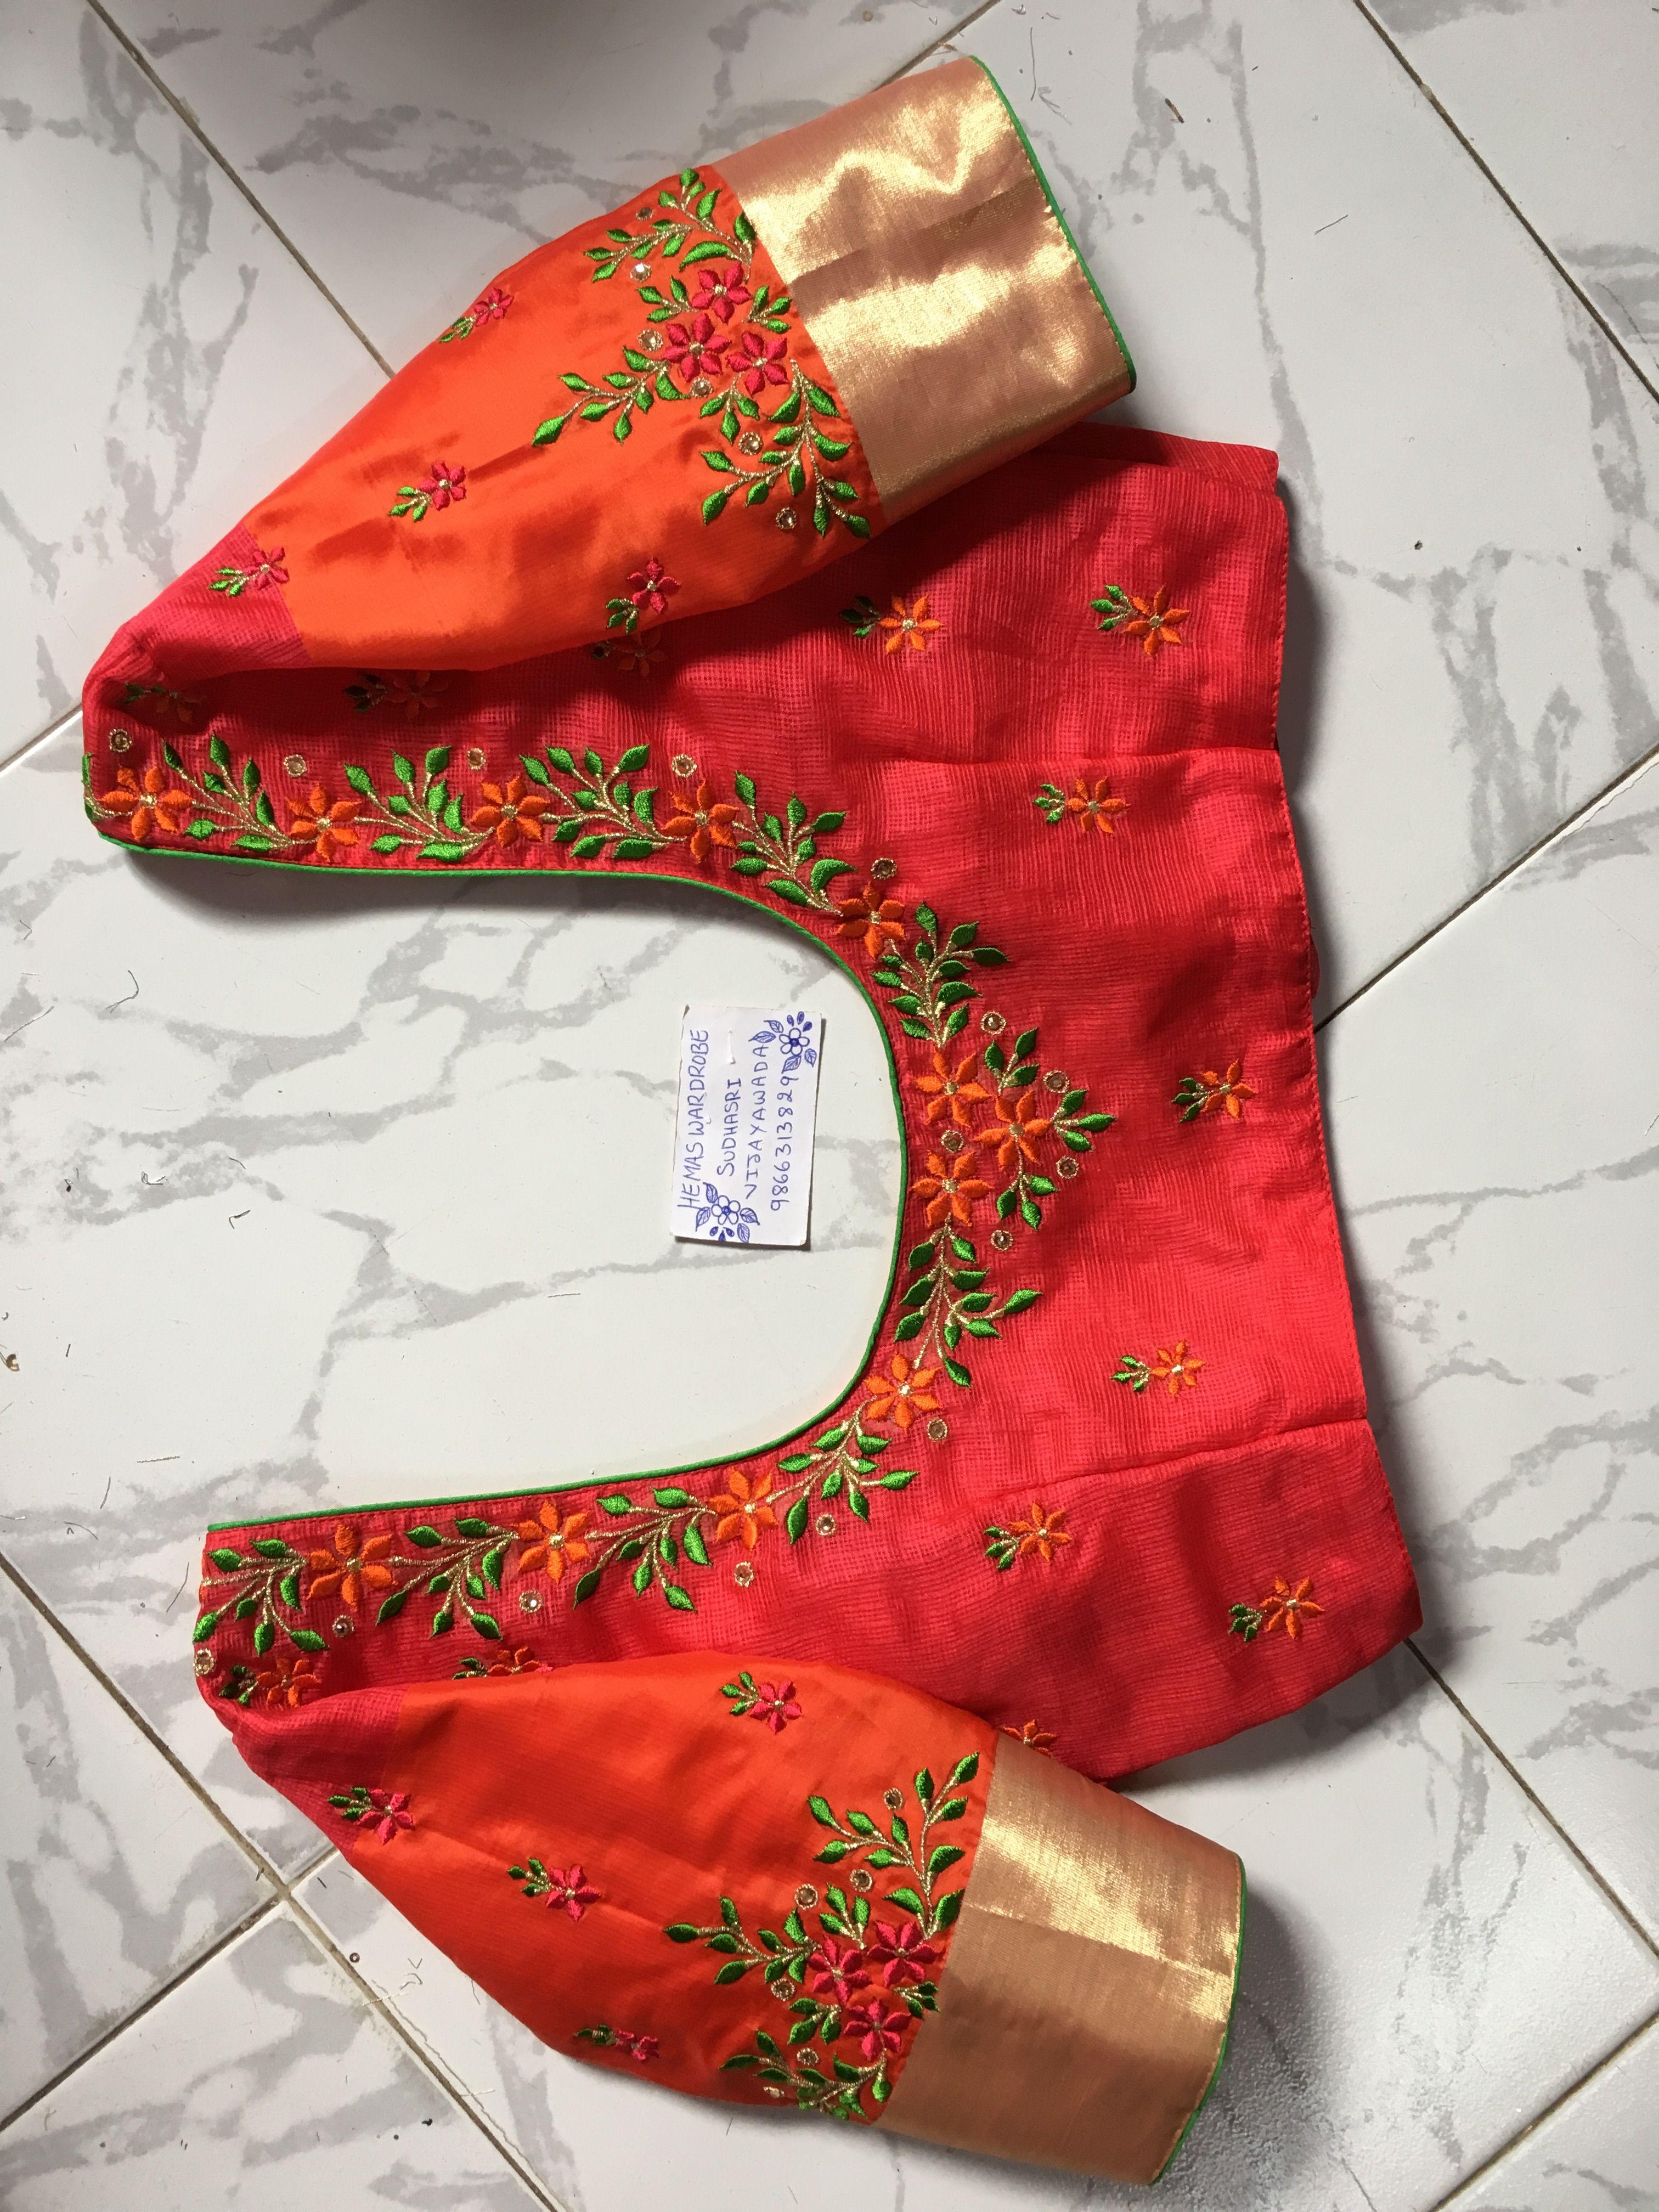 Sudhasri Hemaswardrobe Embroidery Blouse Designs Fashion Blouse Design Blouse Work Designs,Boutique Fashion Designer Studio Interior